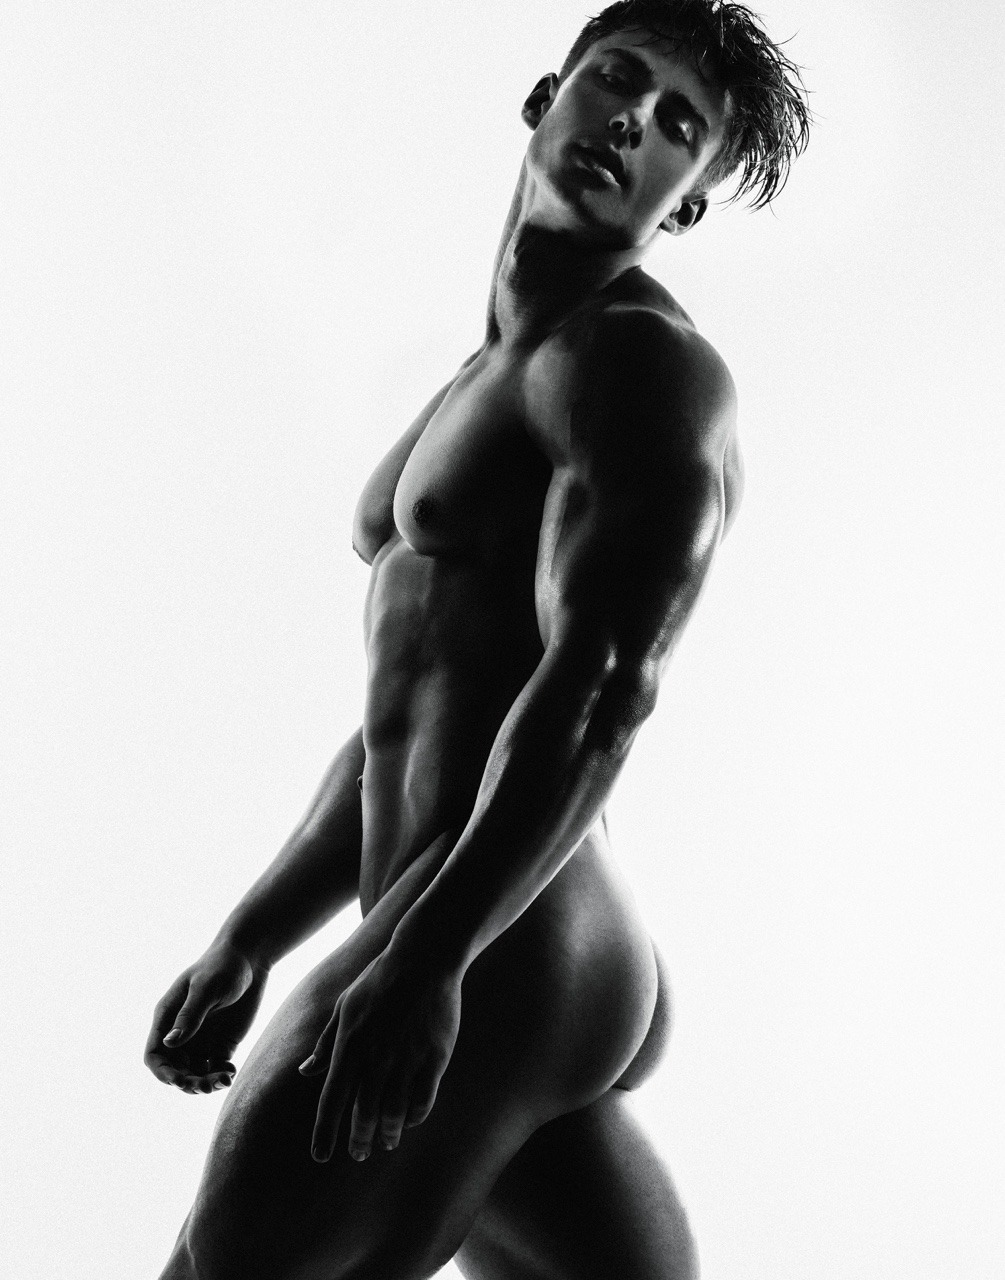 Profile of sprinter tyson gay